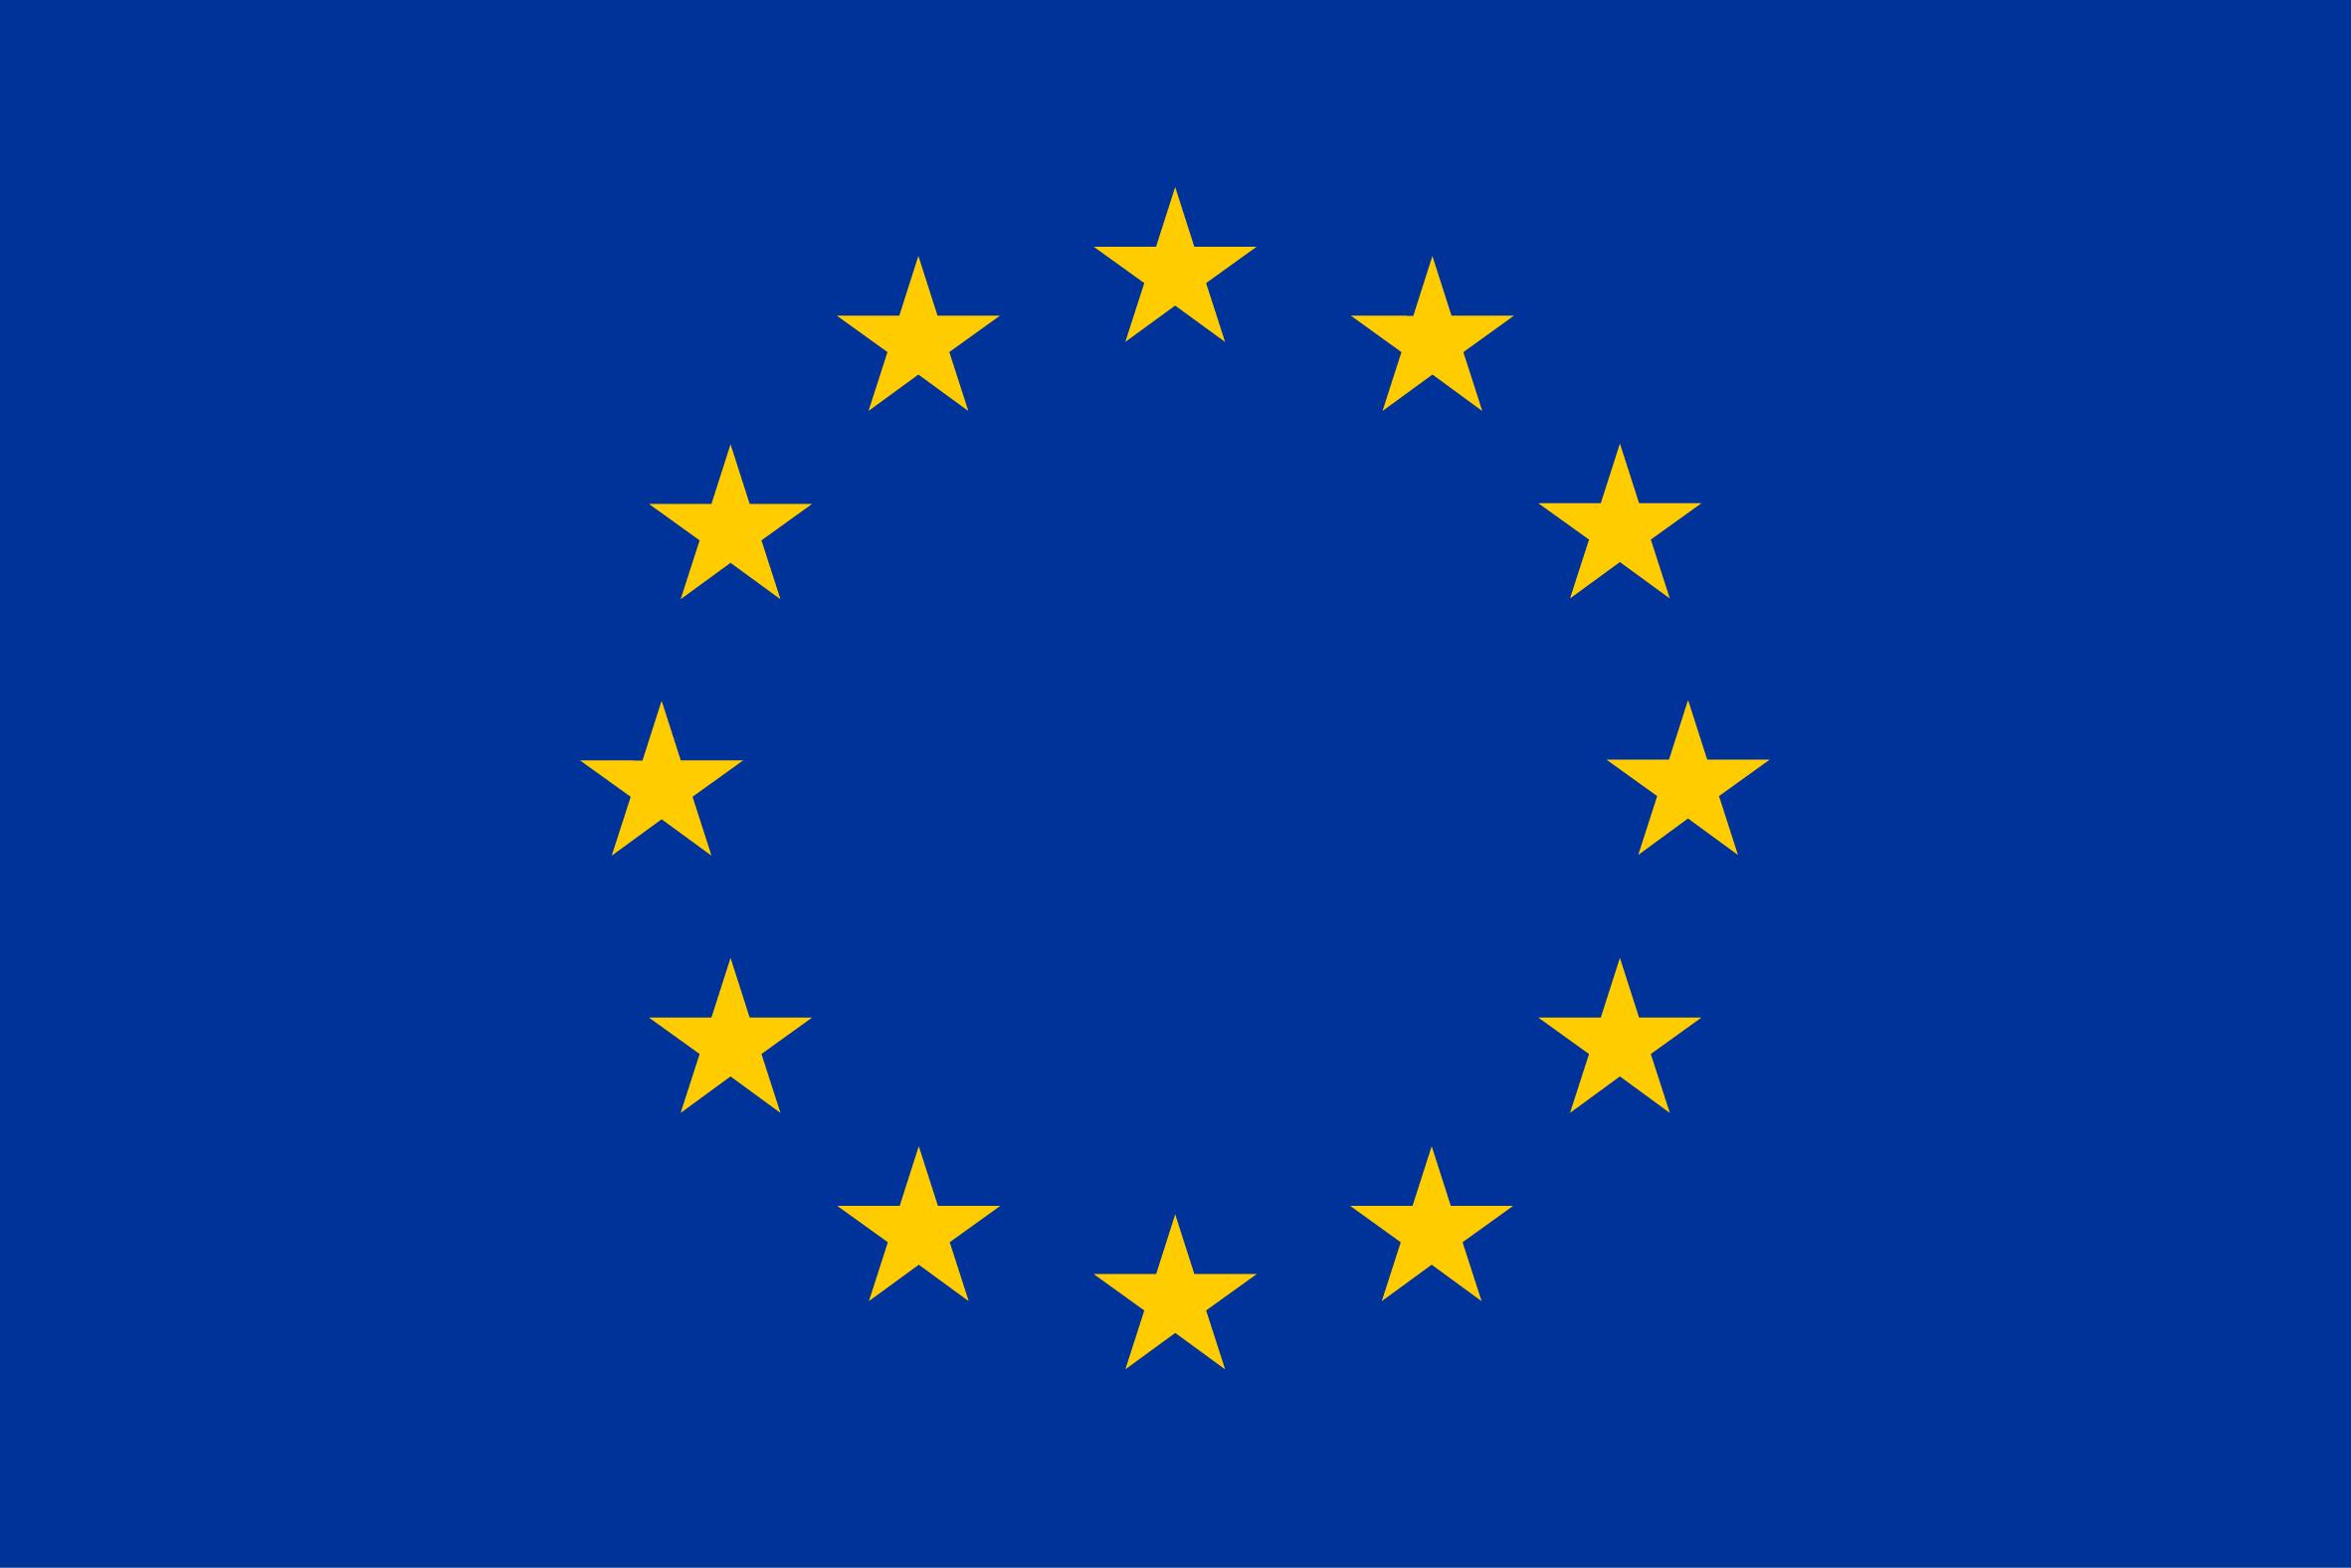 eu-flag_yellow_high.jpg (206 KB)